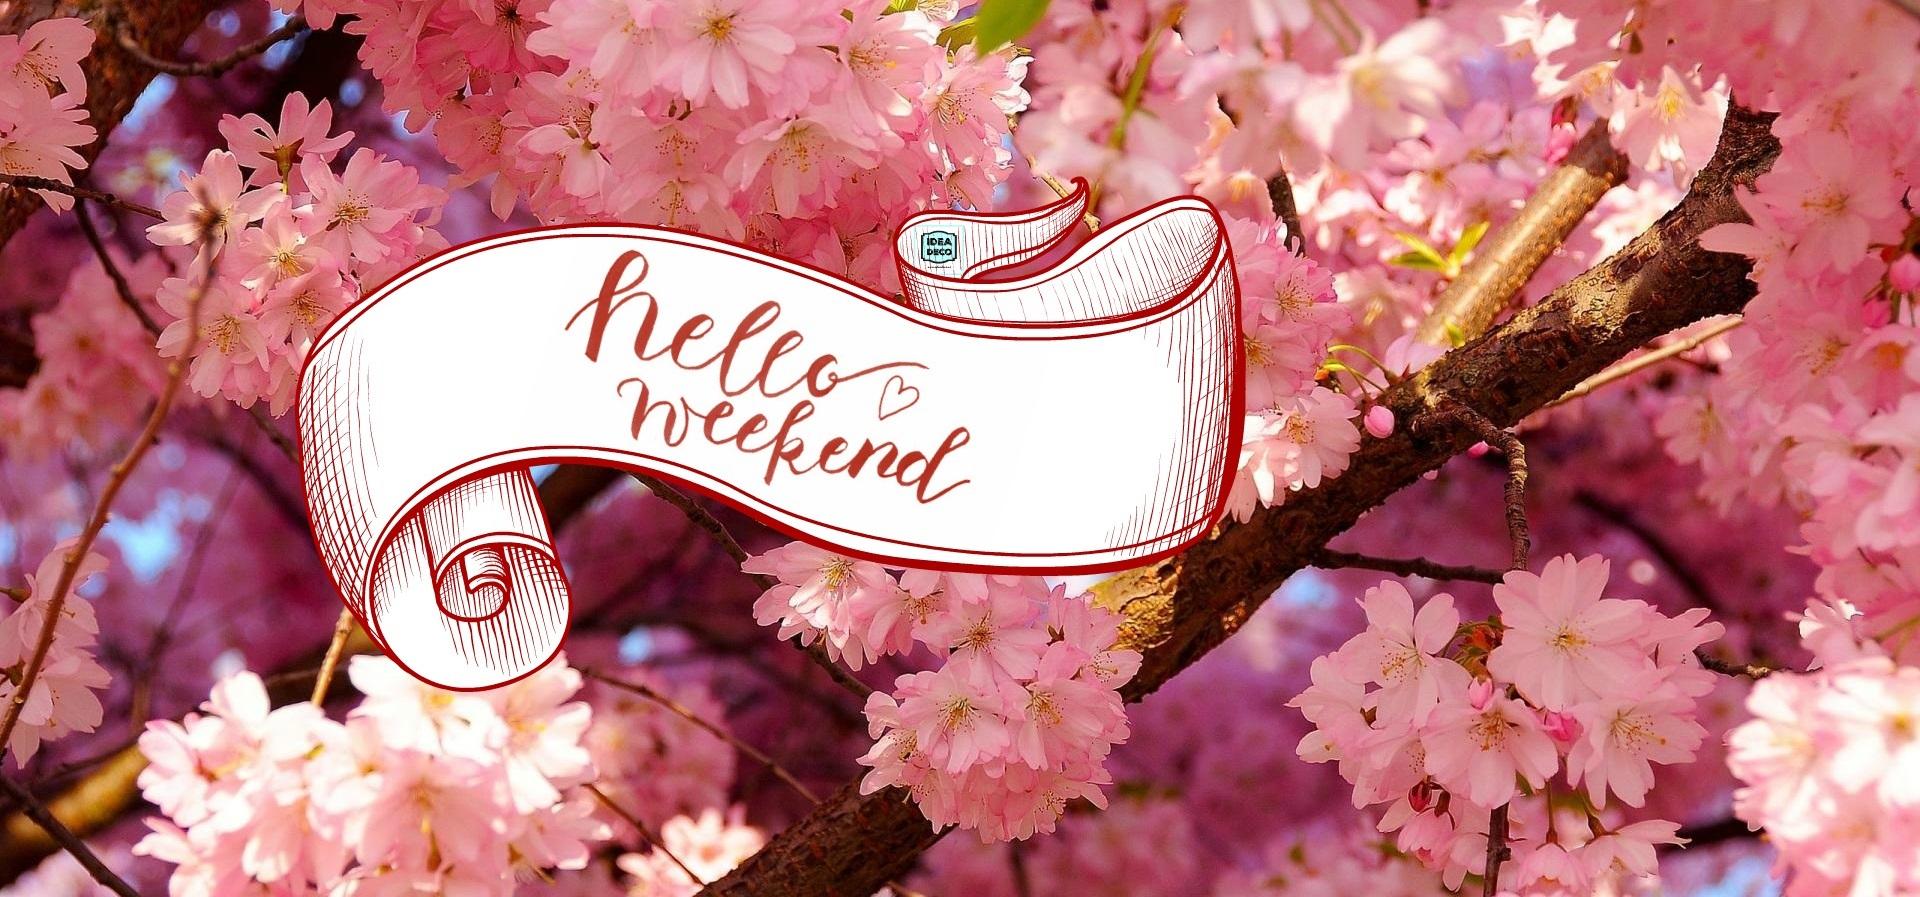 Hello Weekend IdeaDeco